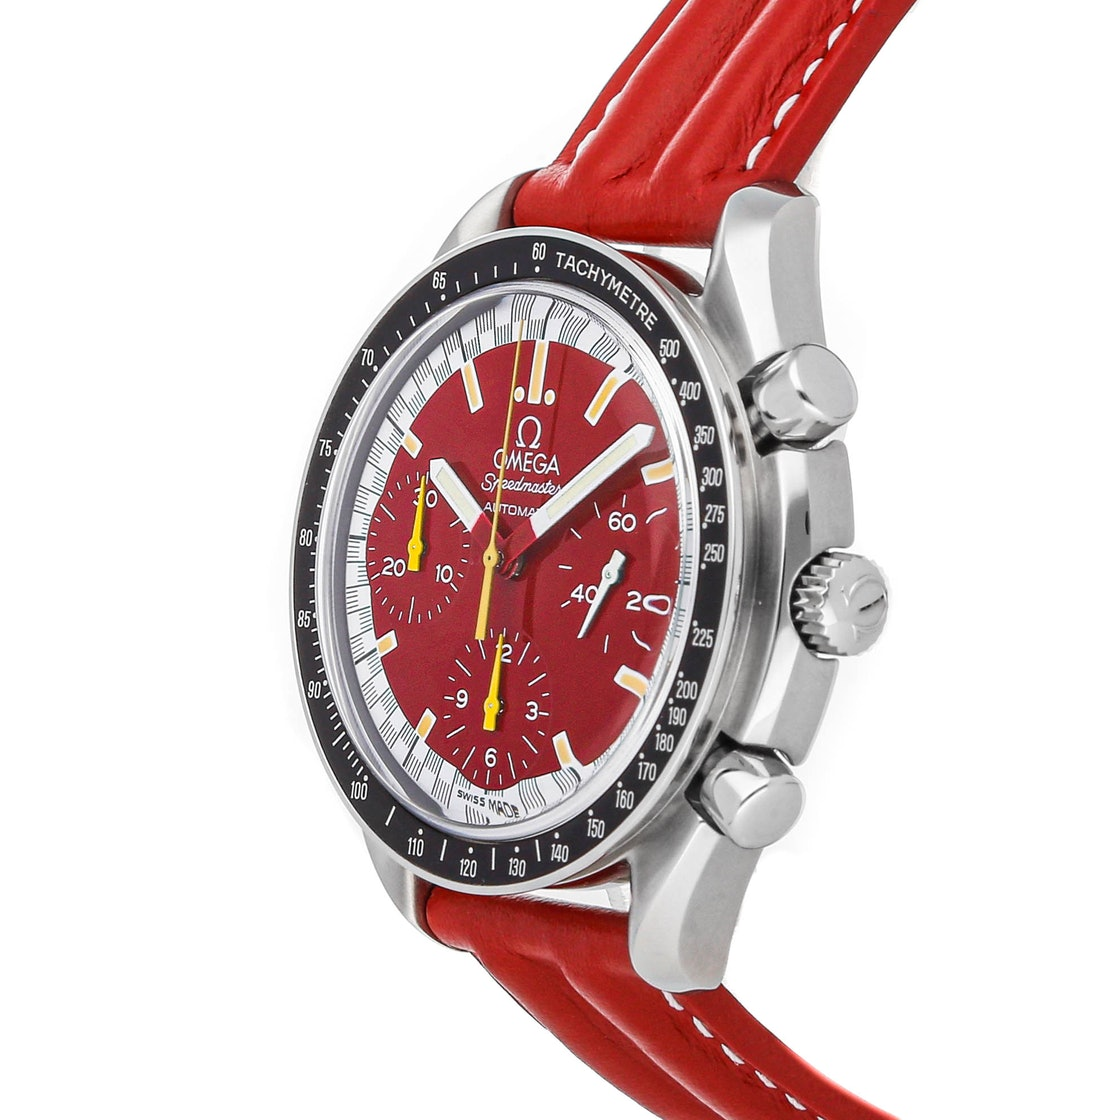 Omega Speedmaster Reduced Schumacher Chronograph 3810.61.41